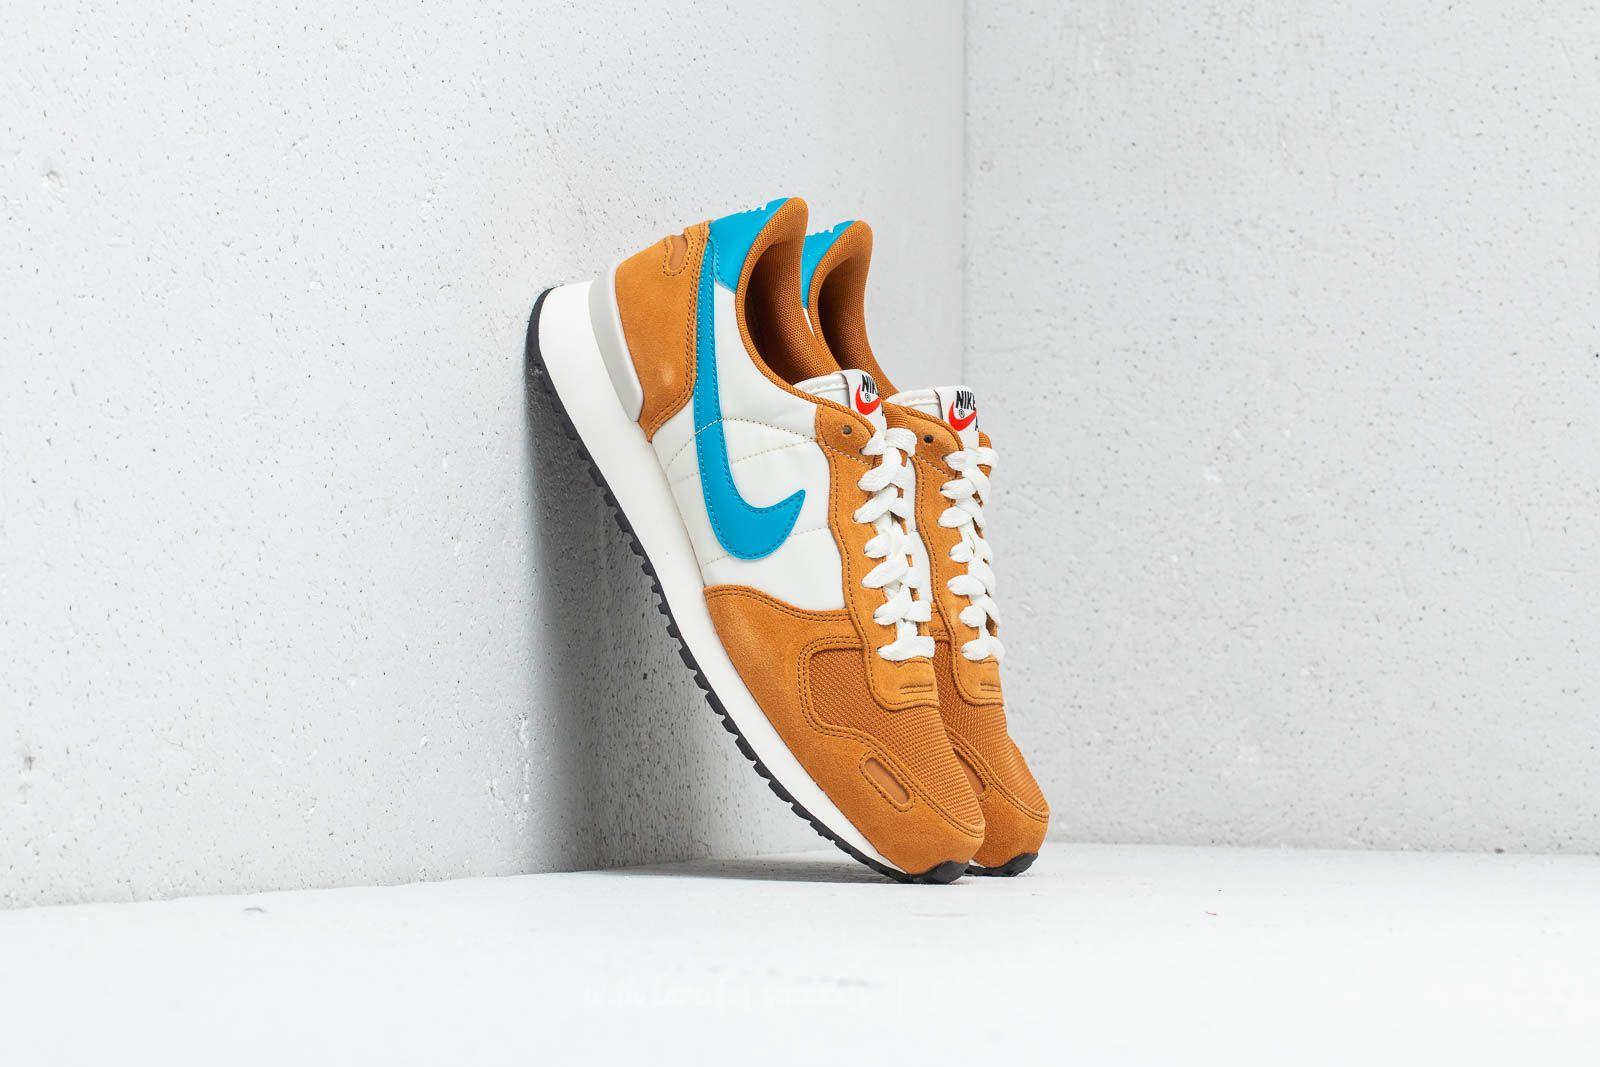 temerario cama Eliminación  Men's shoes Nike Air Vortex Desert Ochre/ Blue Orbit